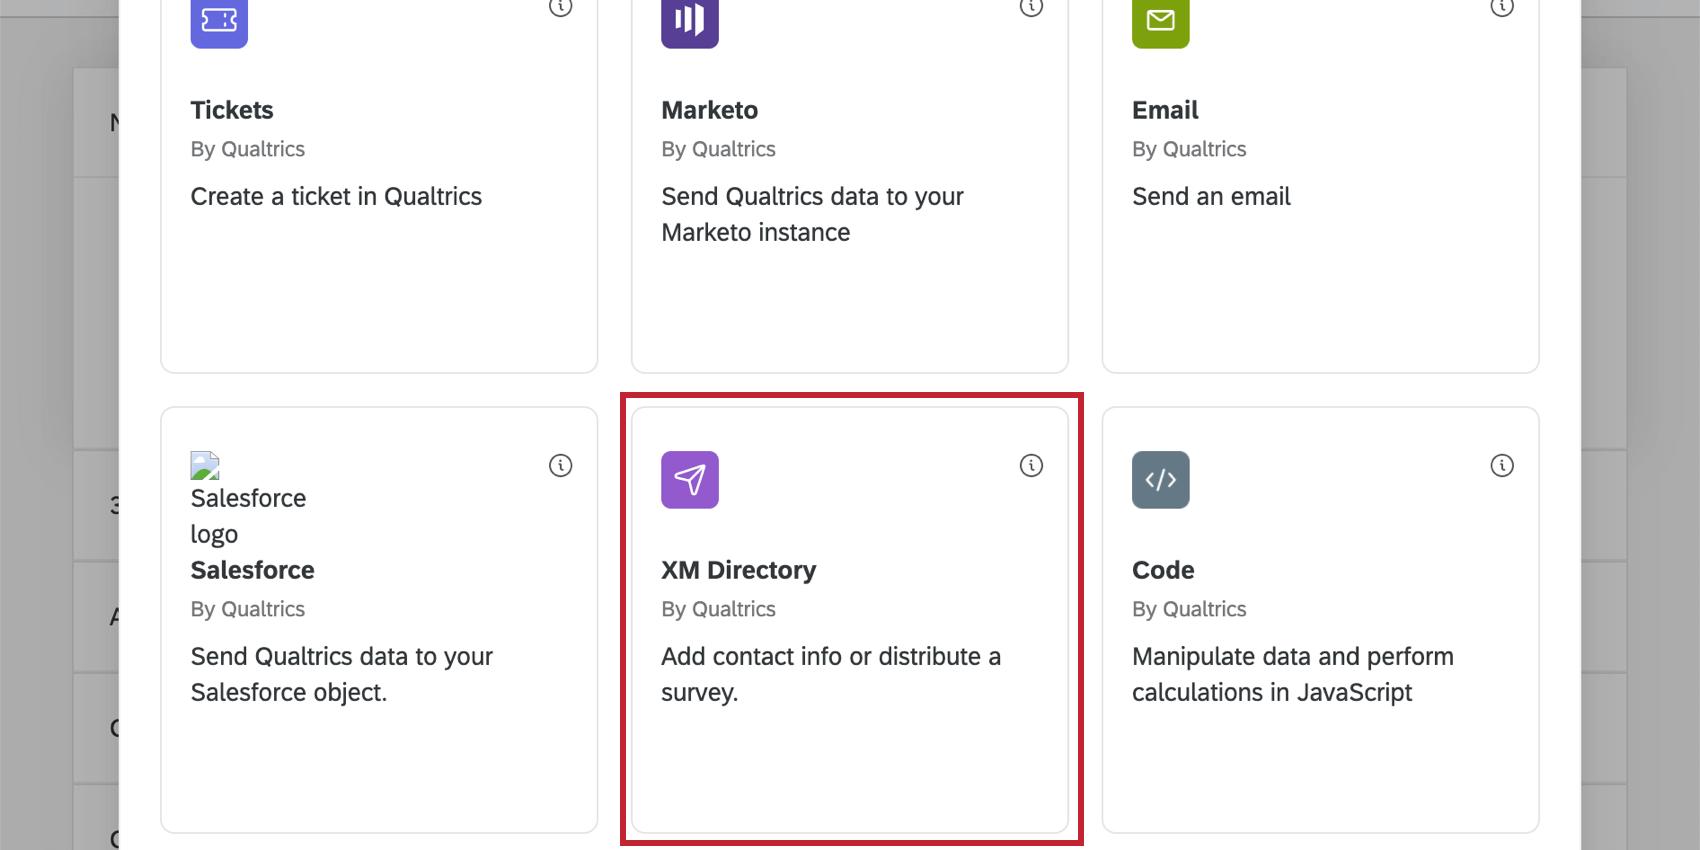 Image of xm directory task in task window